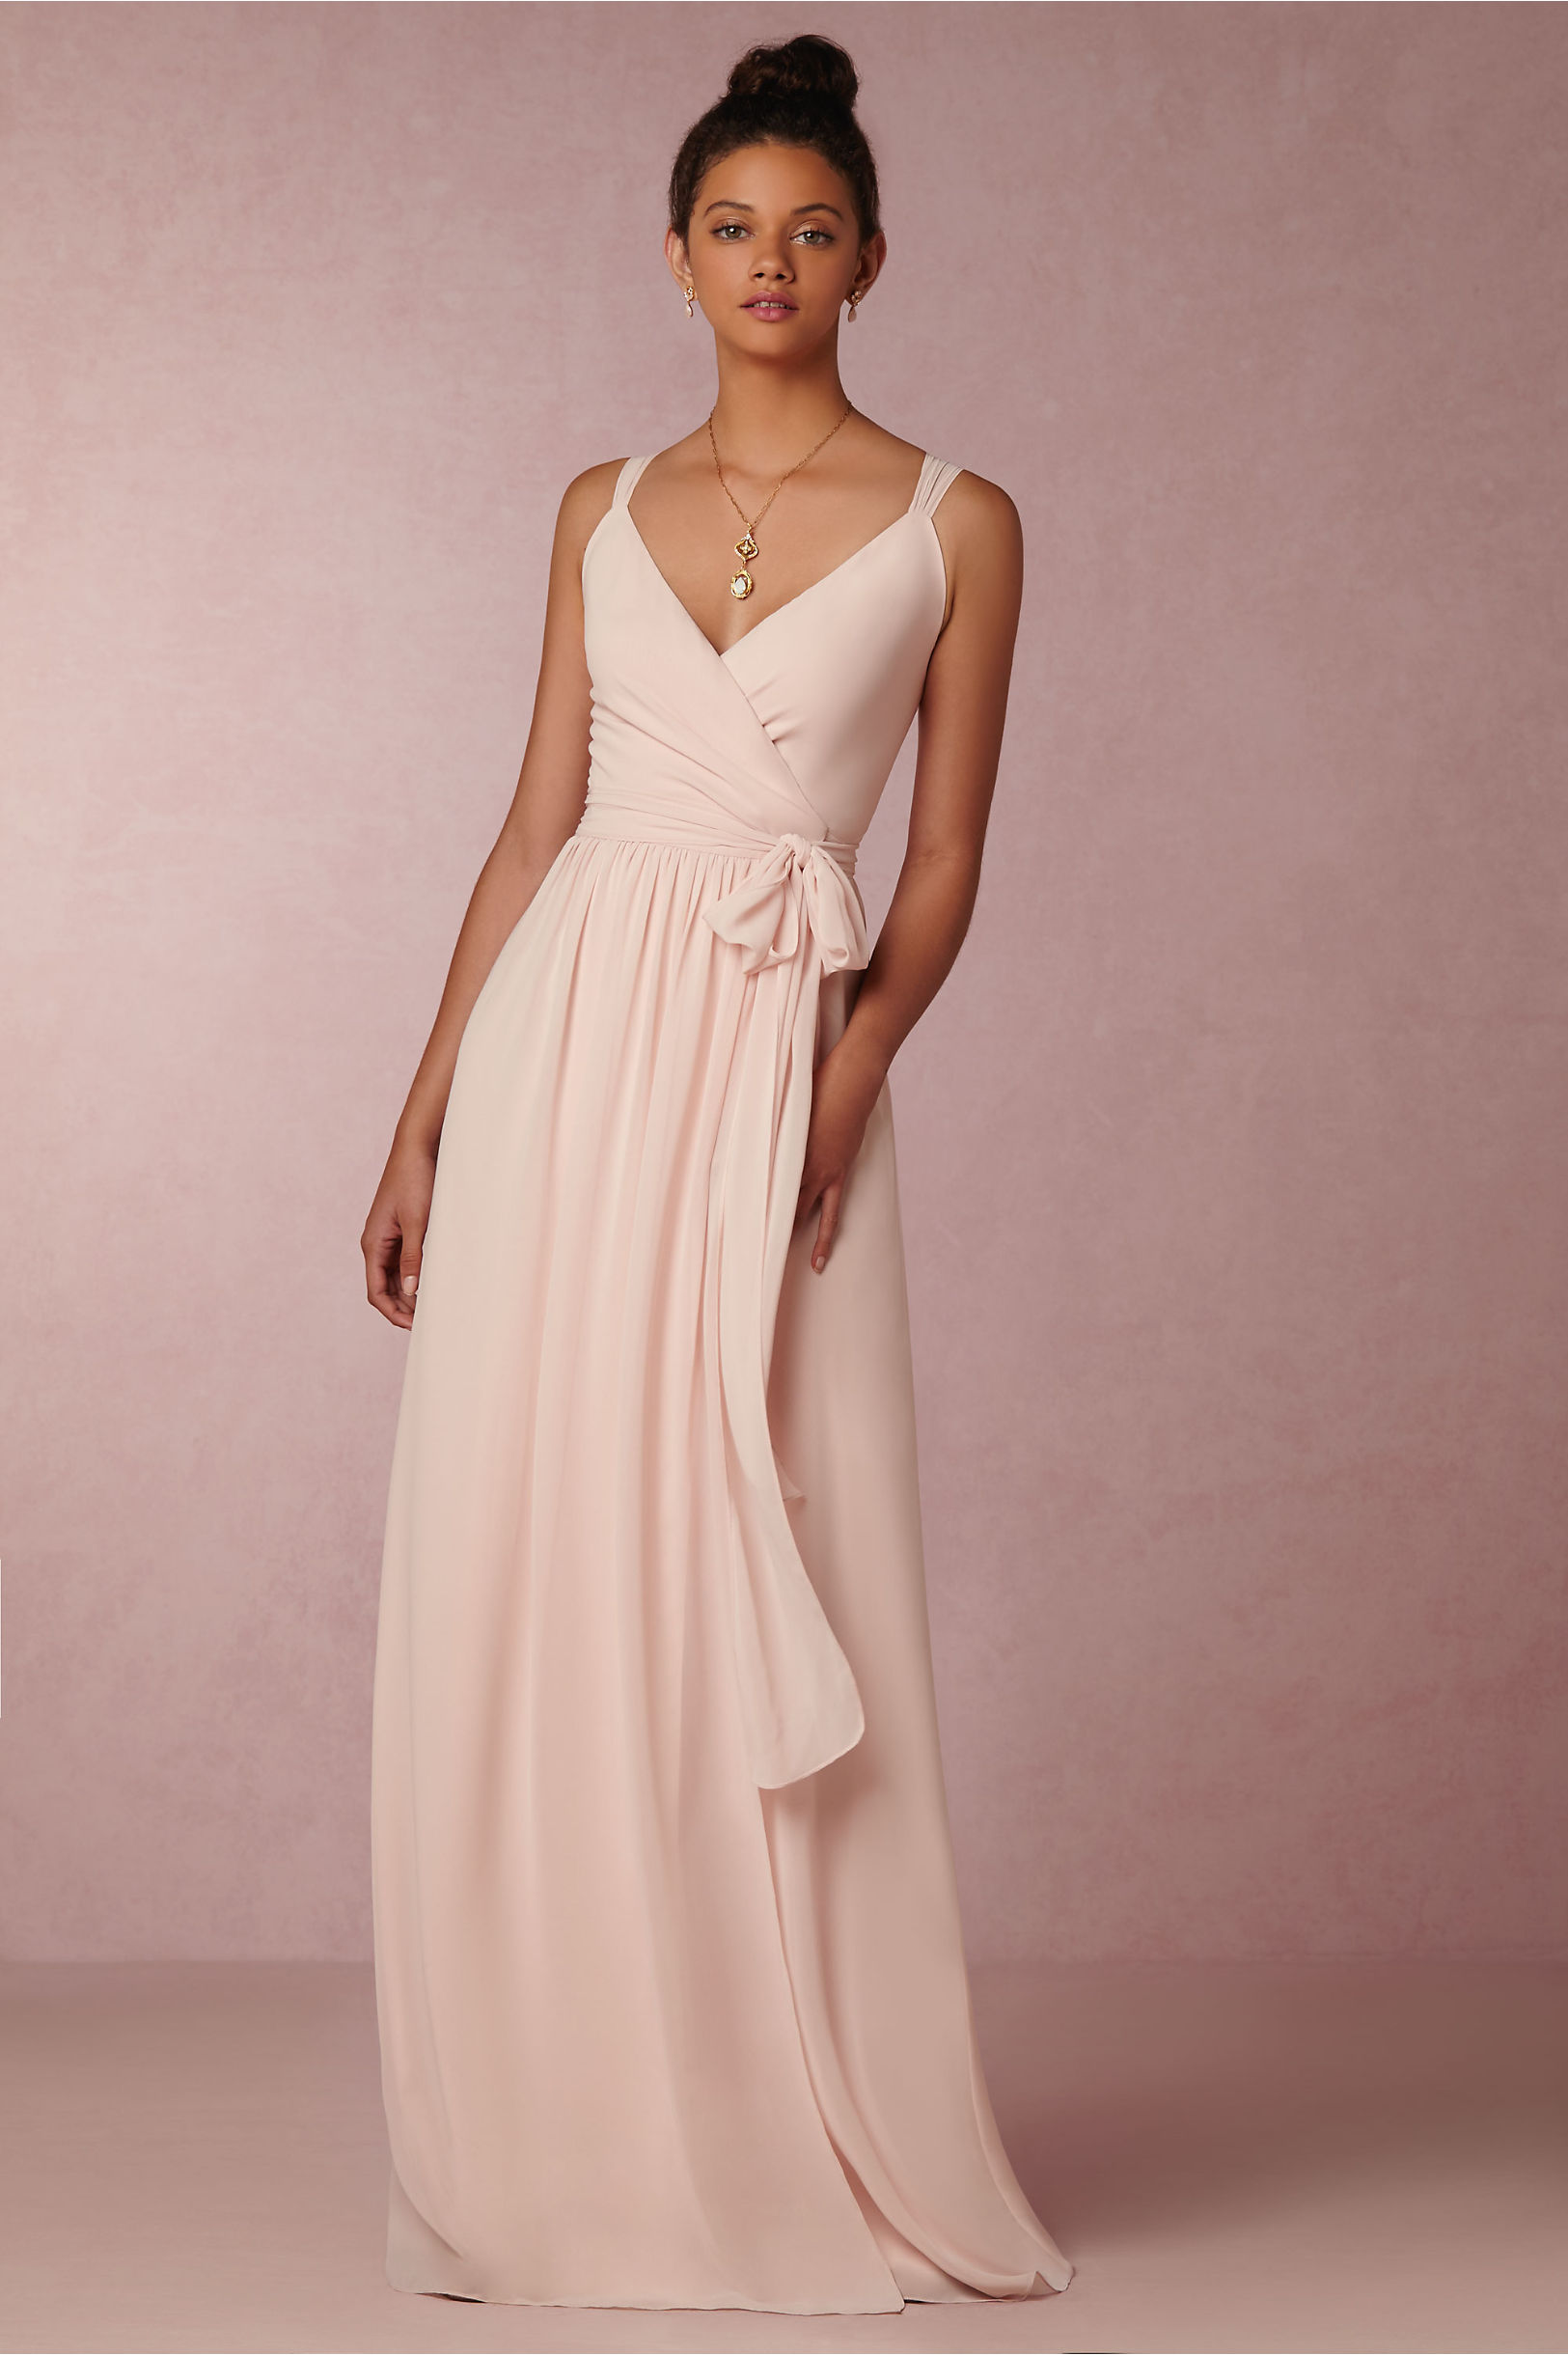 Cadence Dress in Bridal Party | BHLDN